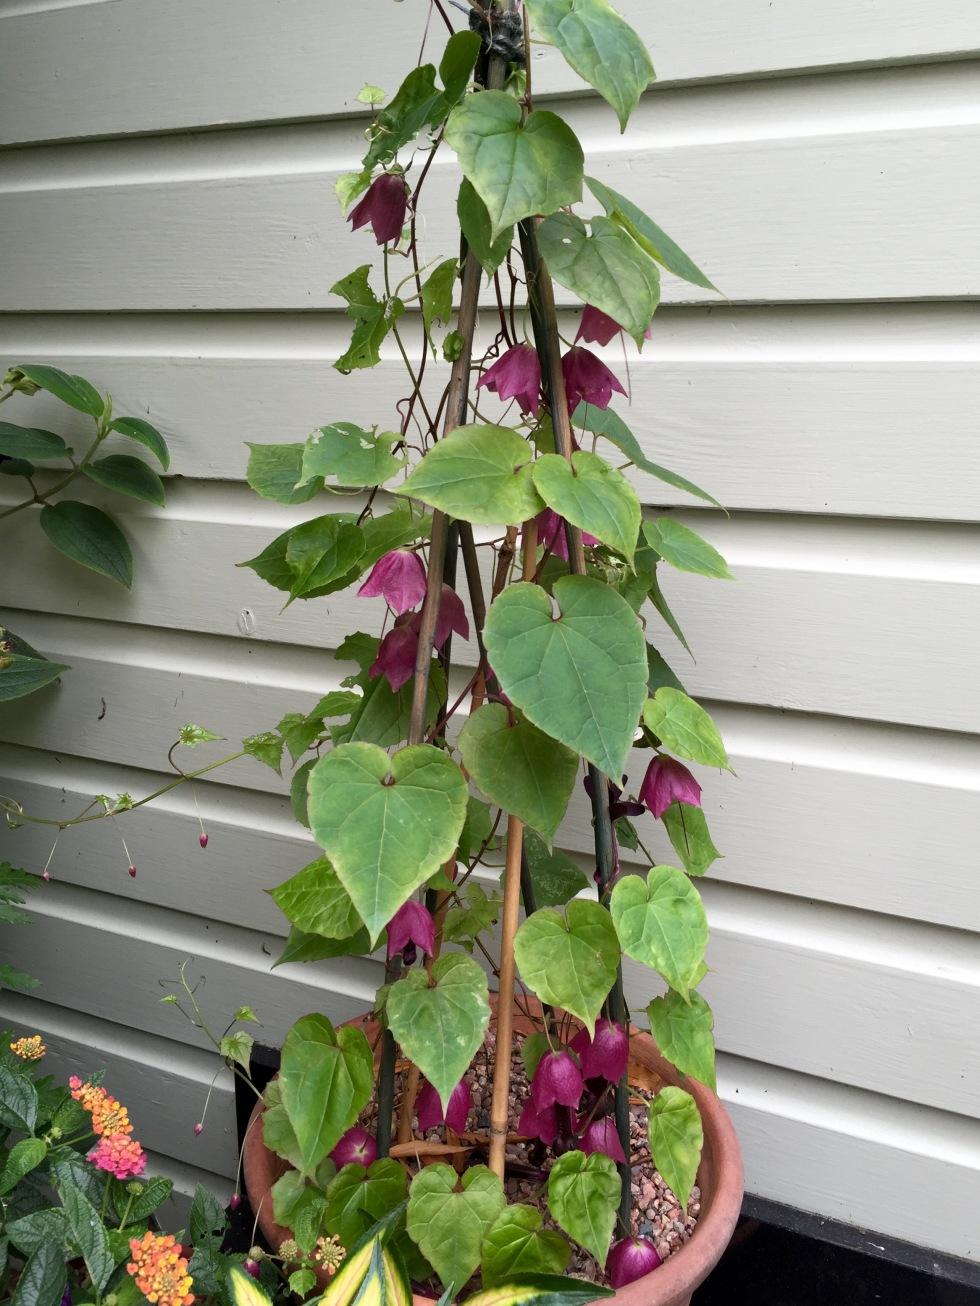 My purple bell vine still has plenty of energy